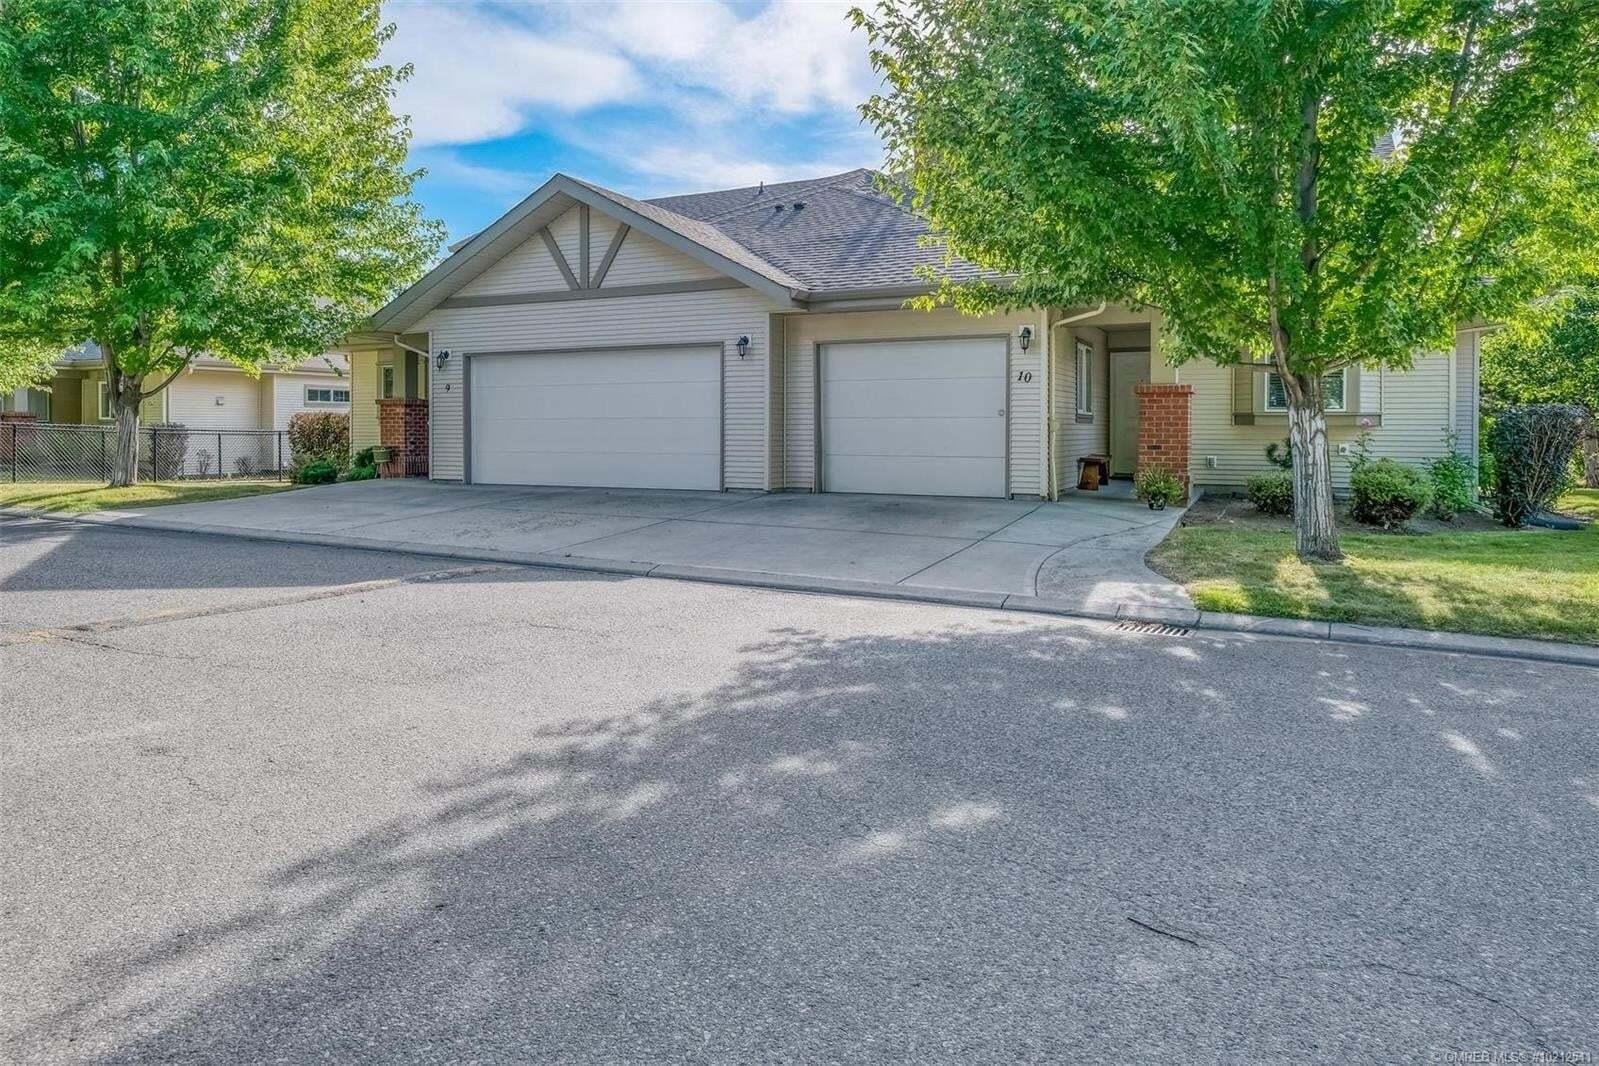 Townhouse for sale at 788 Rutland Rd North Unit 10 Kelowna British Columbia - MLS: 10212541